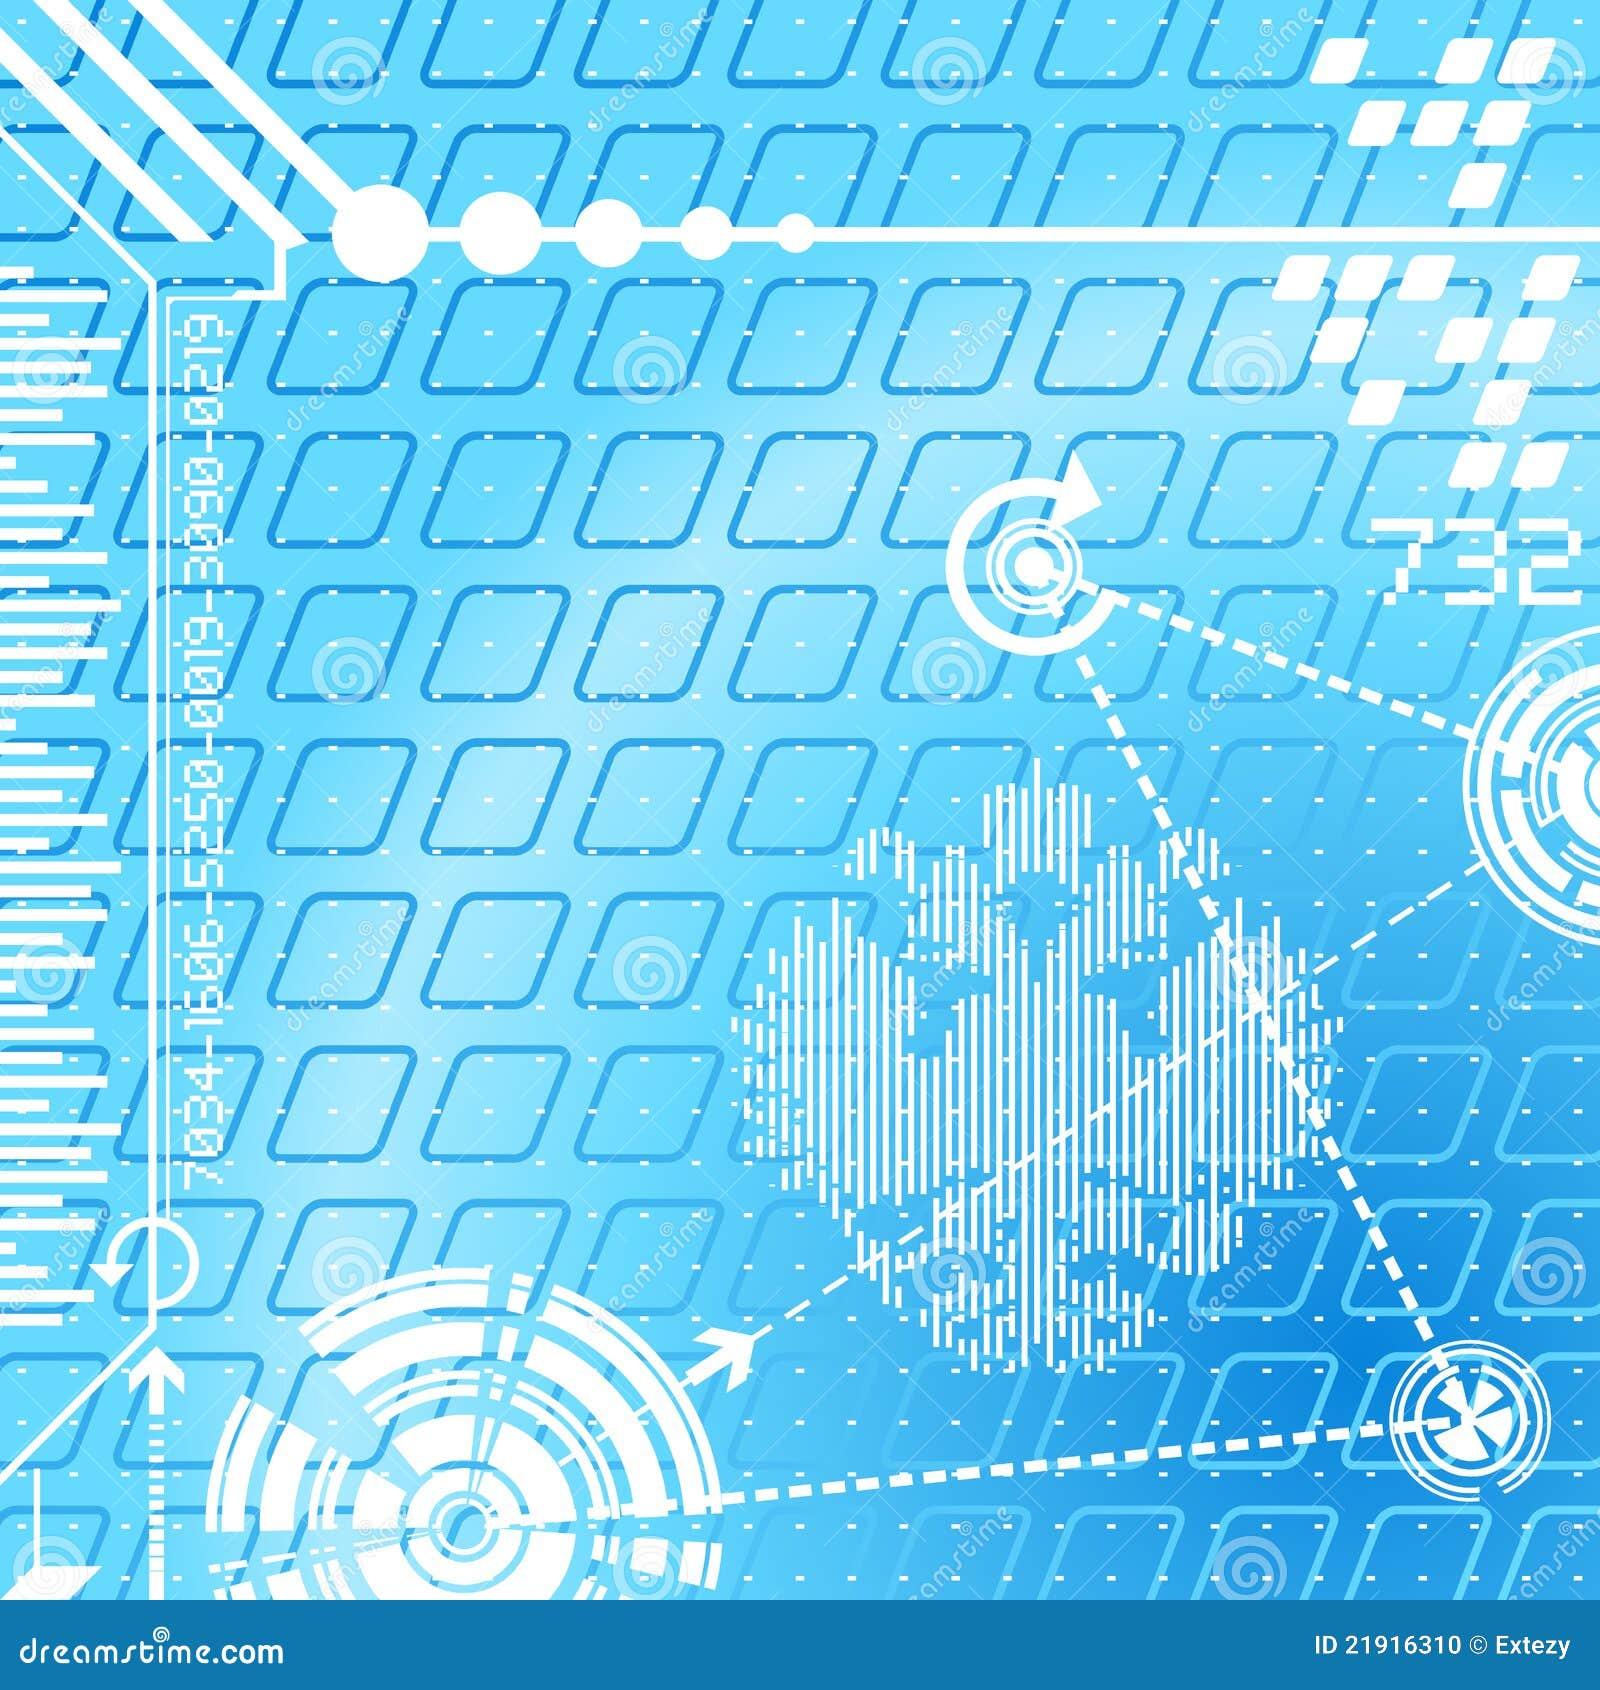 Abstract background digital symbols